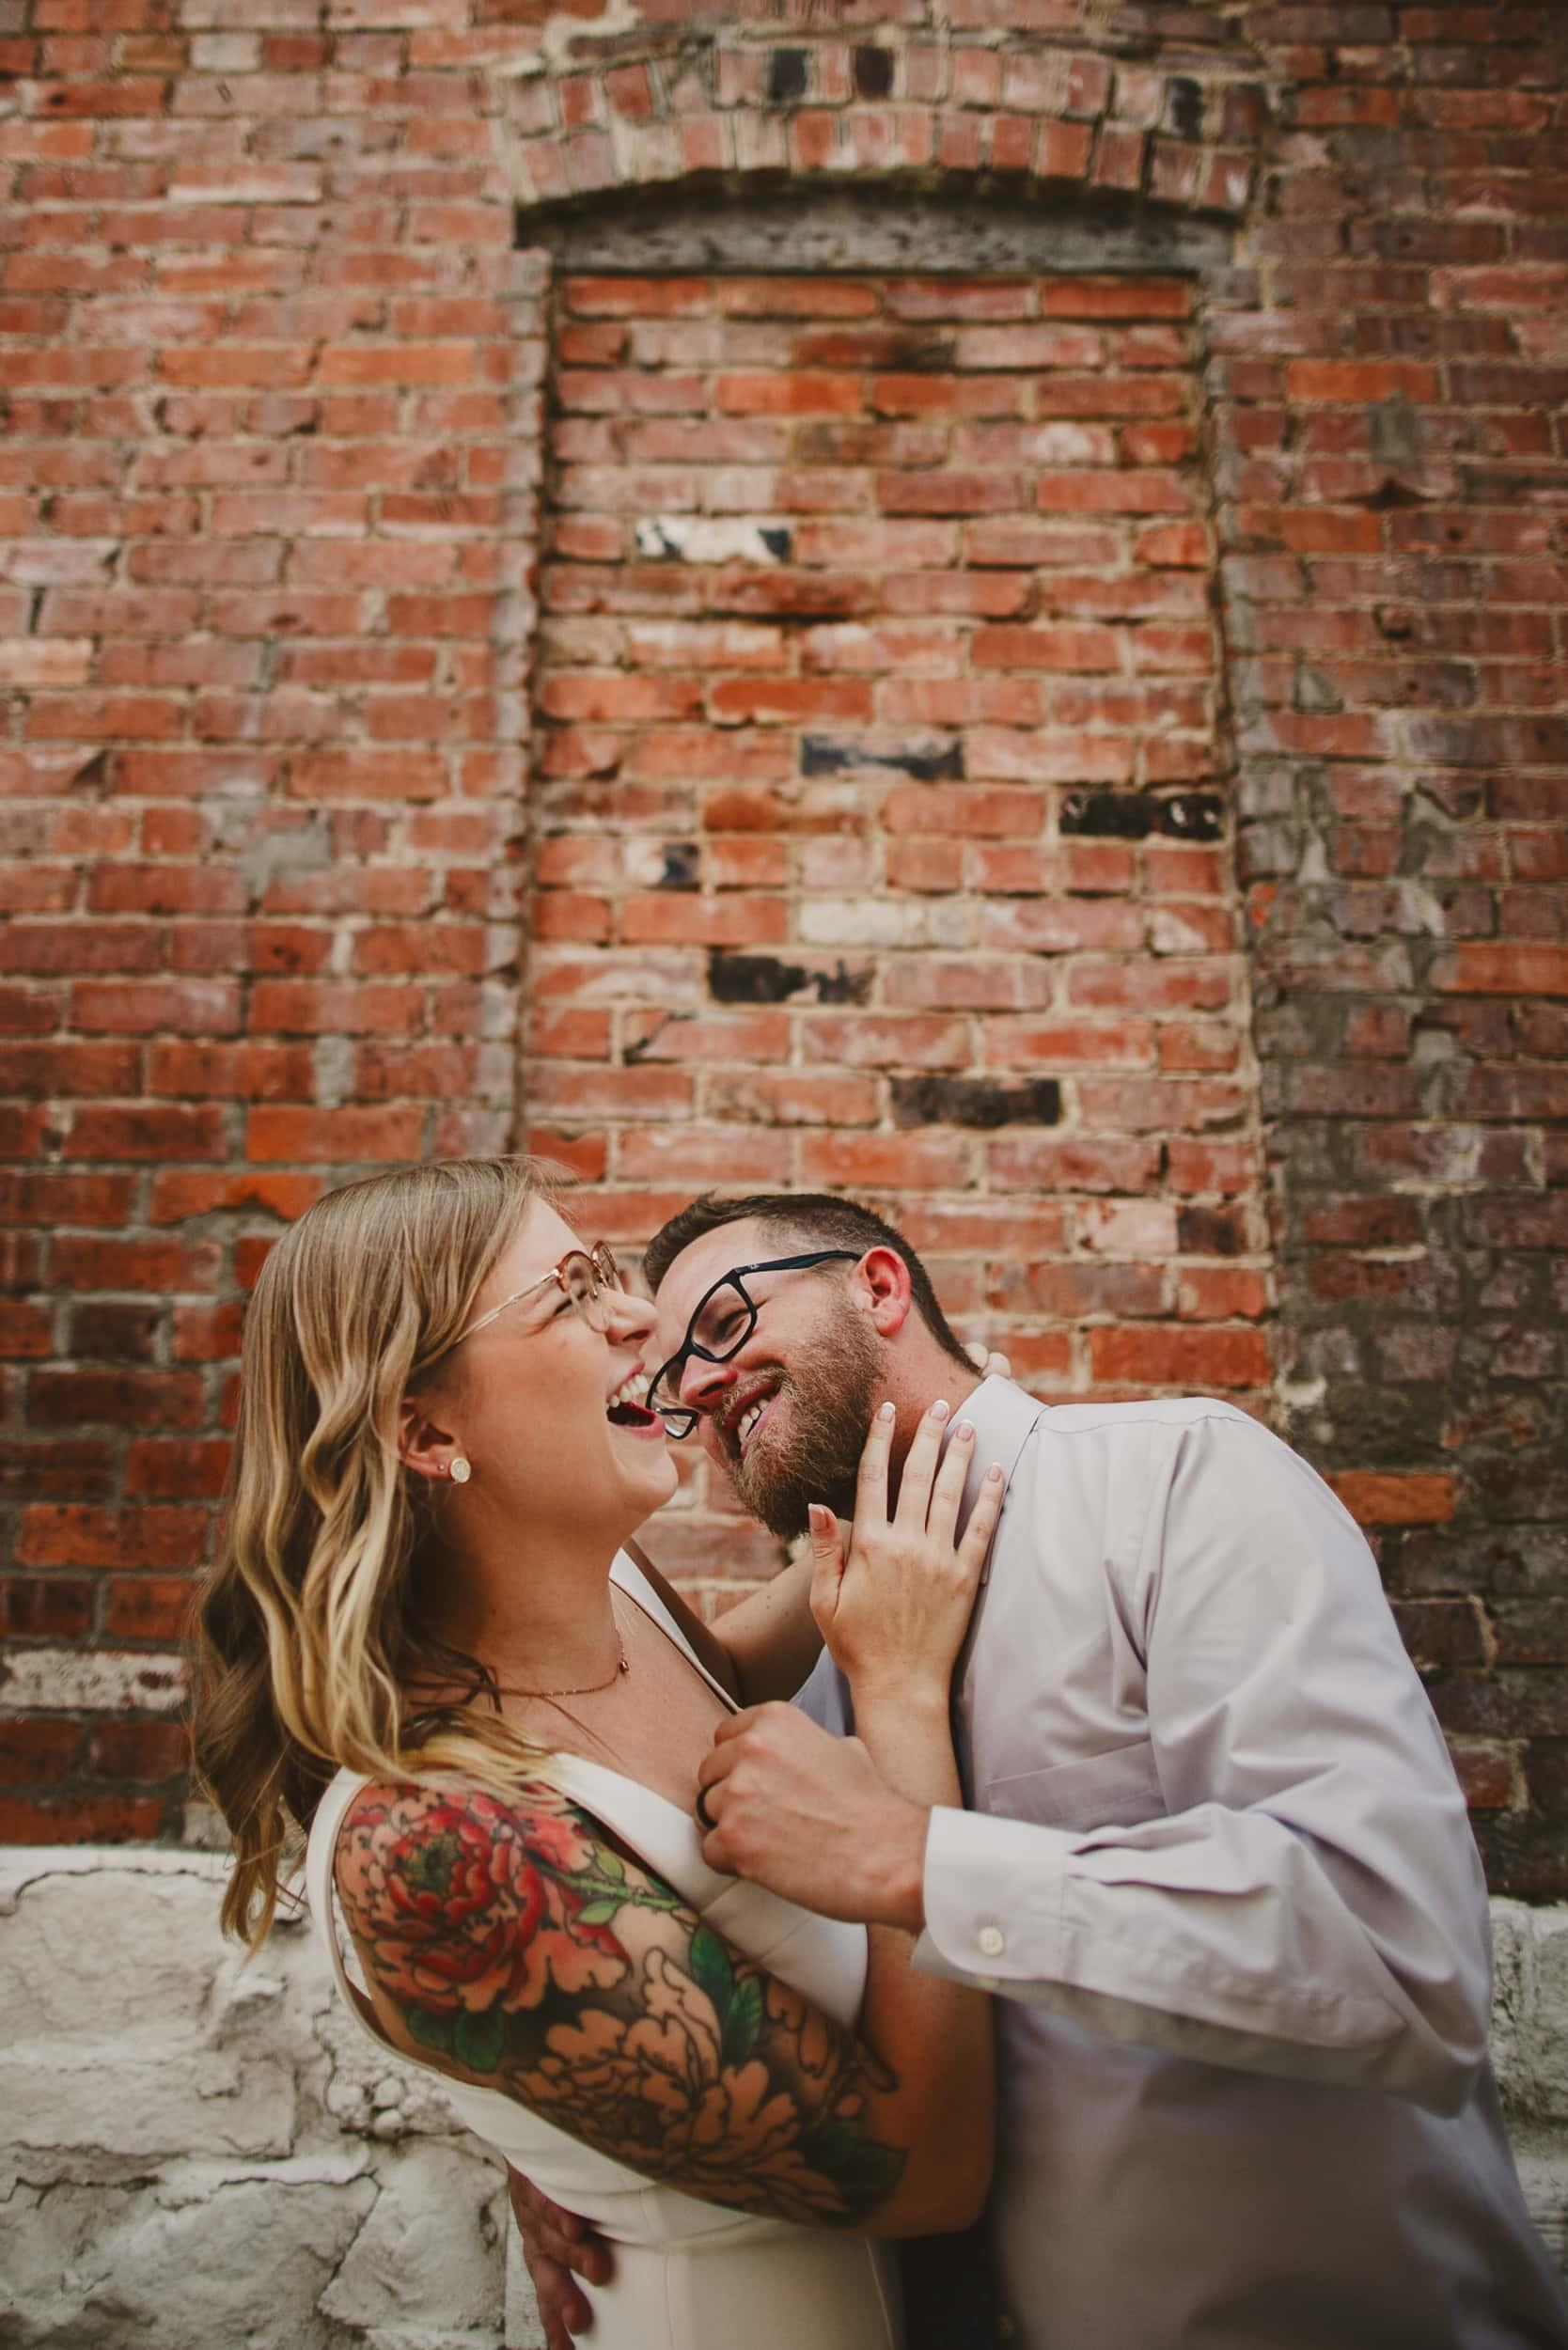 playful-couple-kiss-kate-merrill-photo